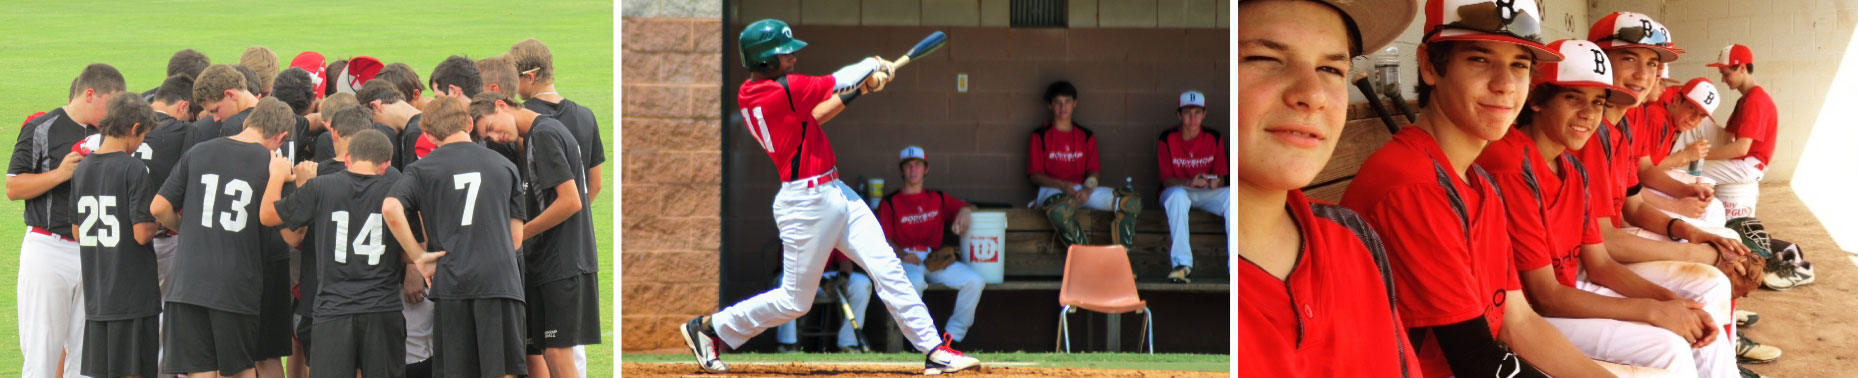 Bodyshop Baseball